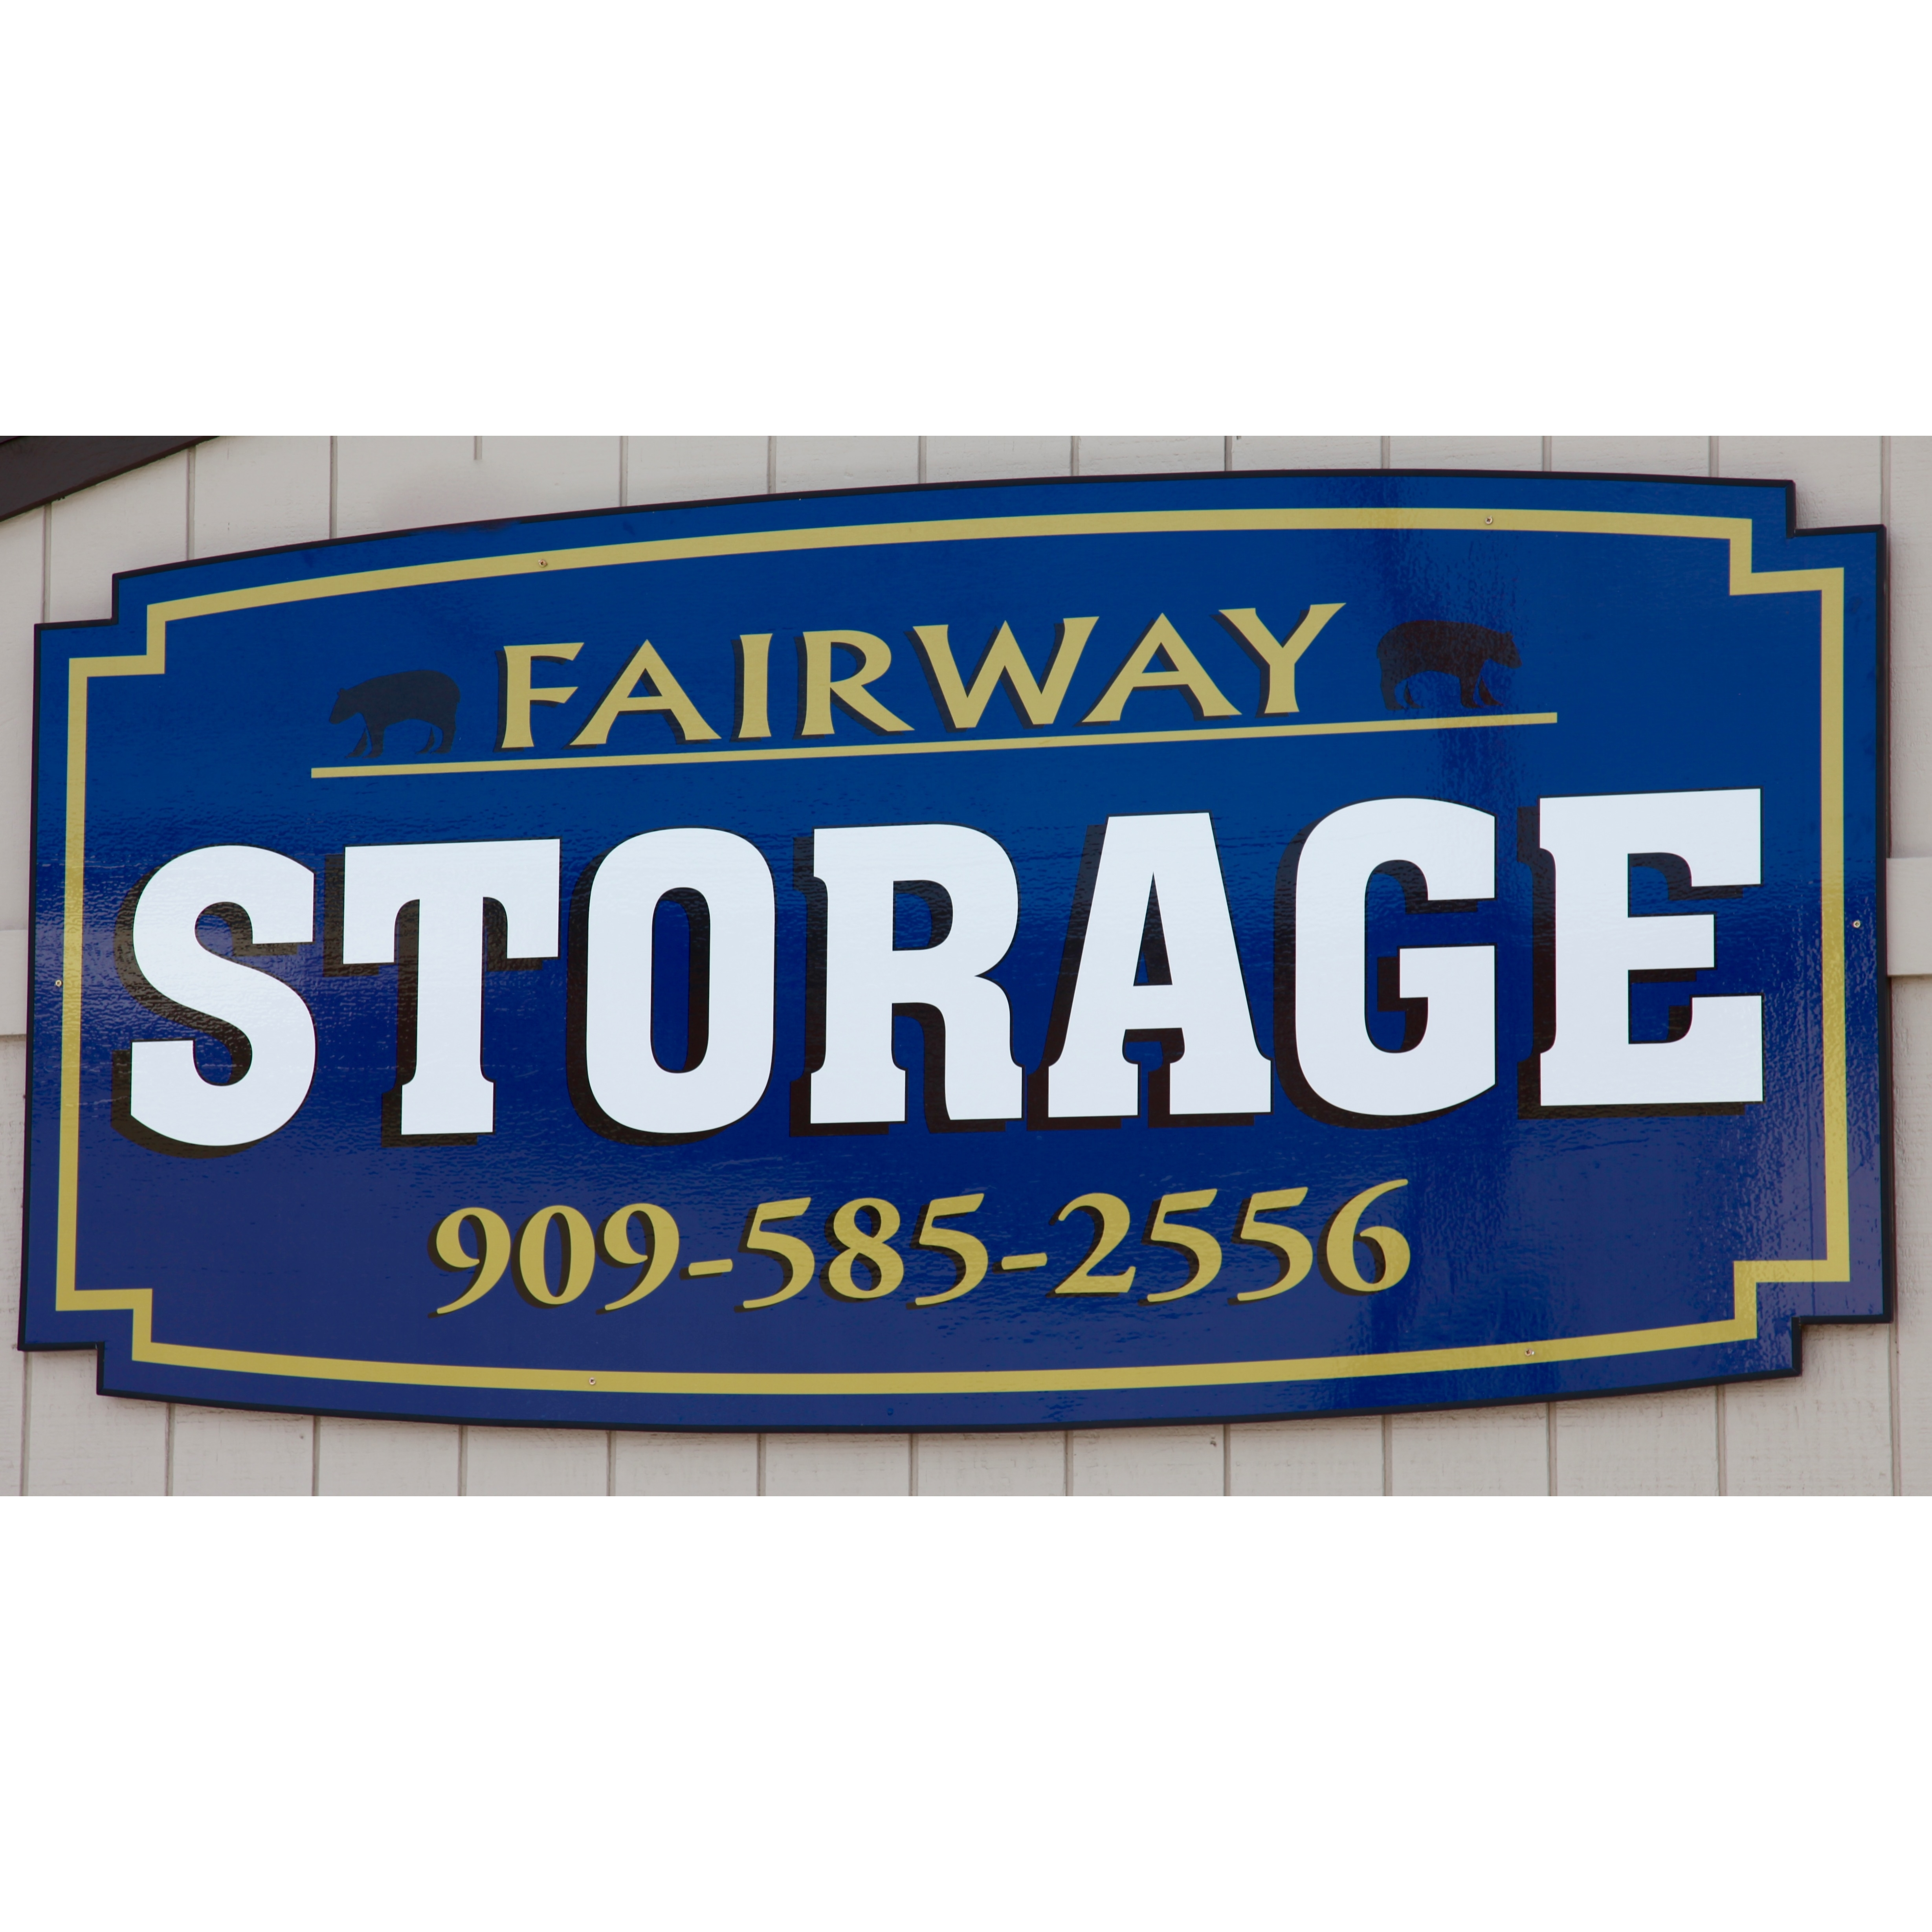 Fairway storage big bear 408 w fairway blvd big bear city for Fairway house cleaning